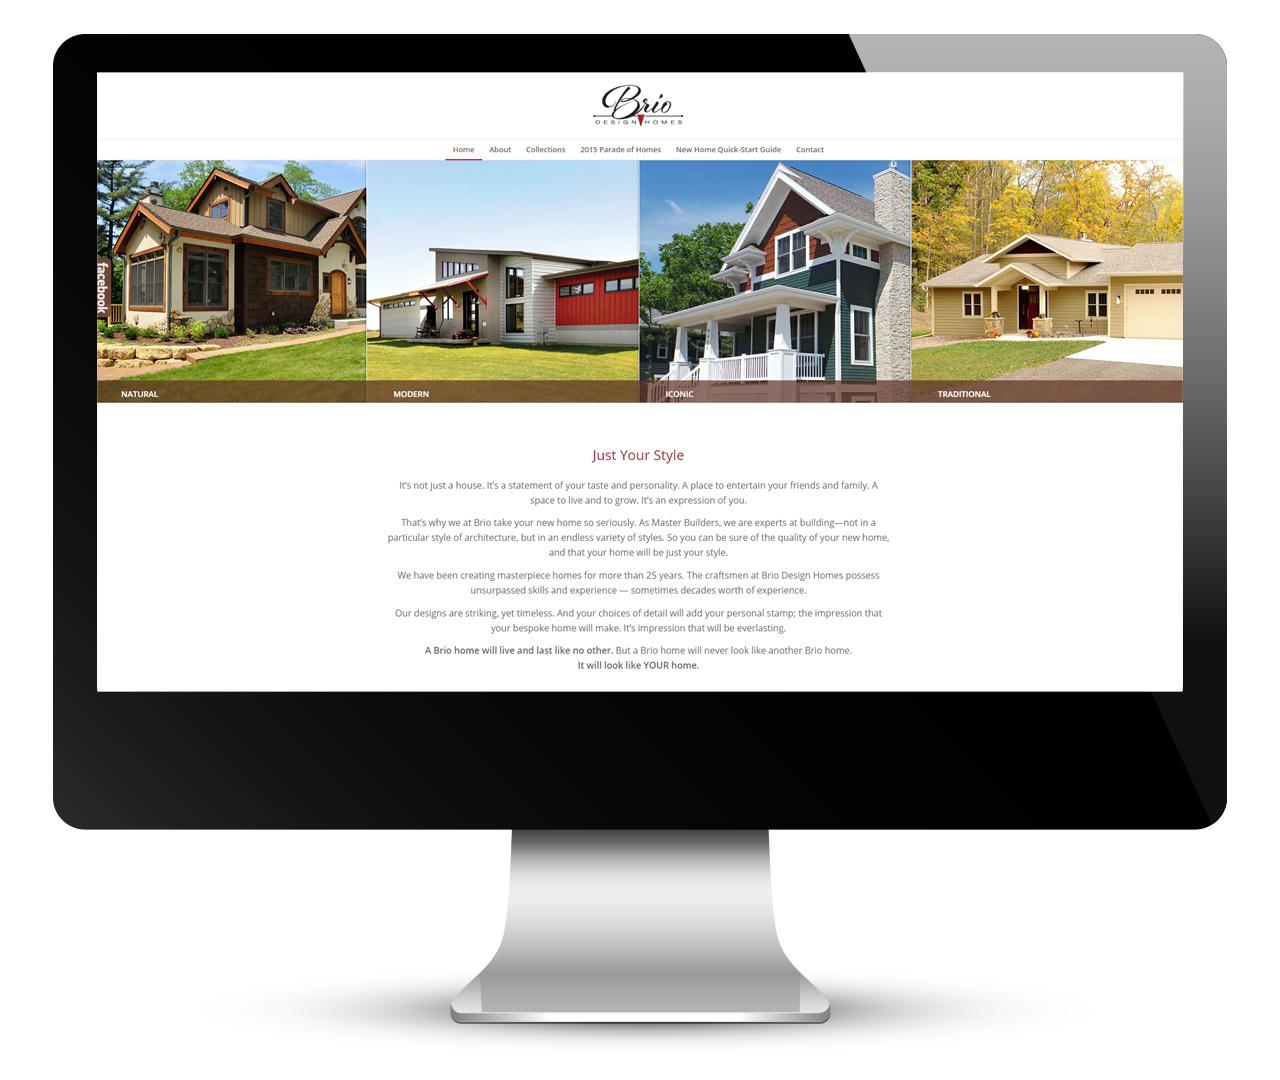 Brio Digital Marketing: Website Design, Slide 1